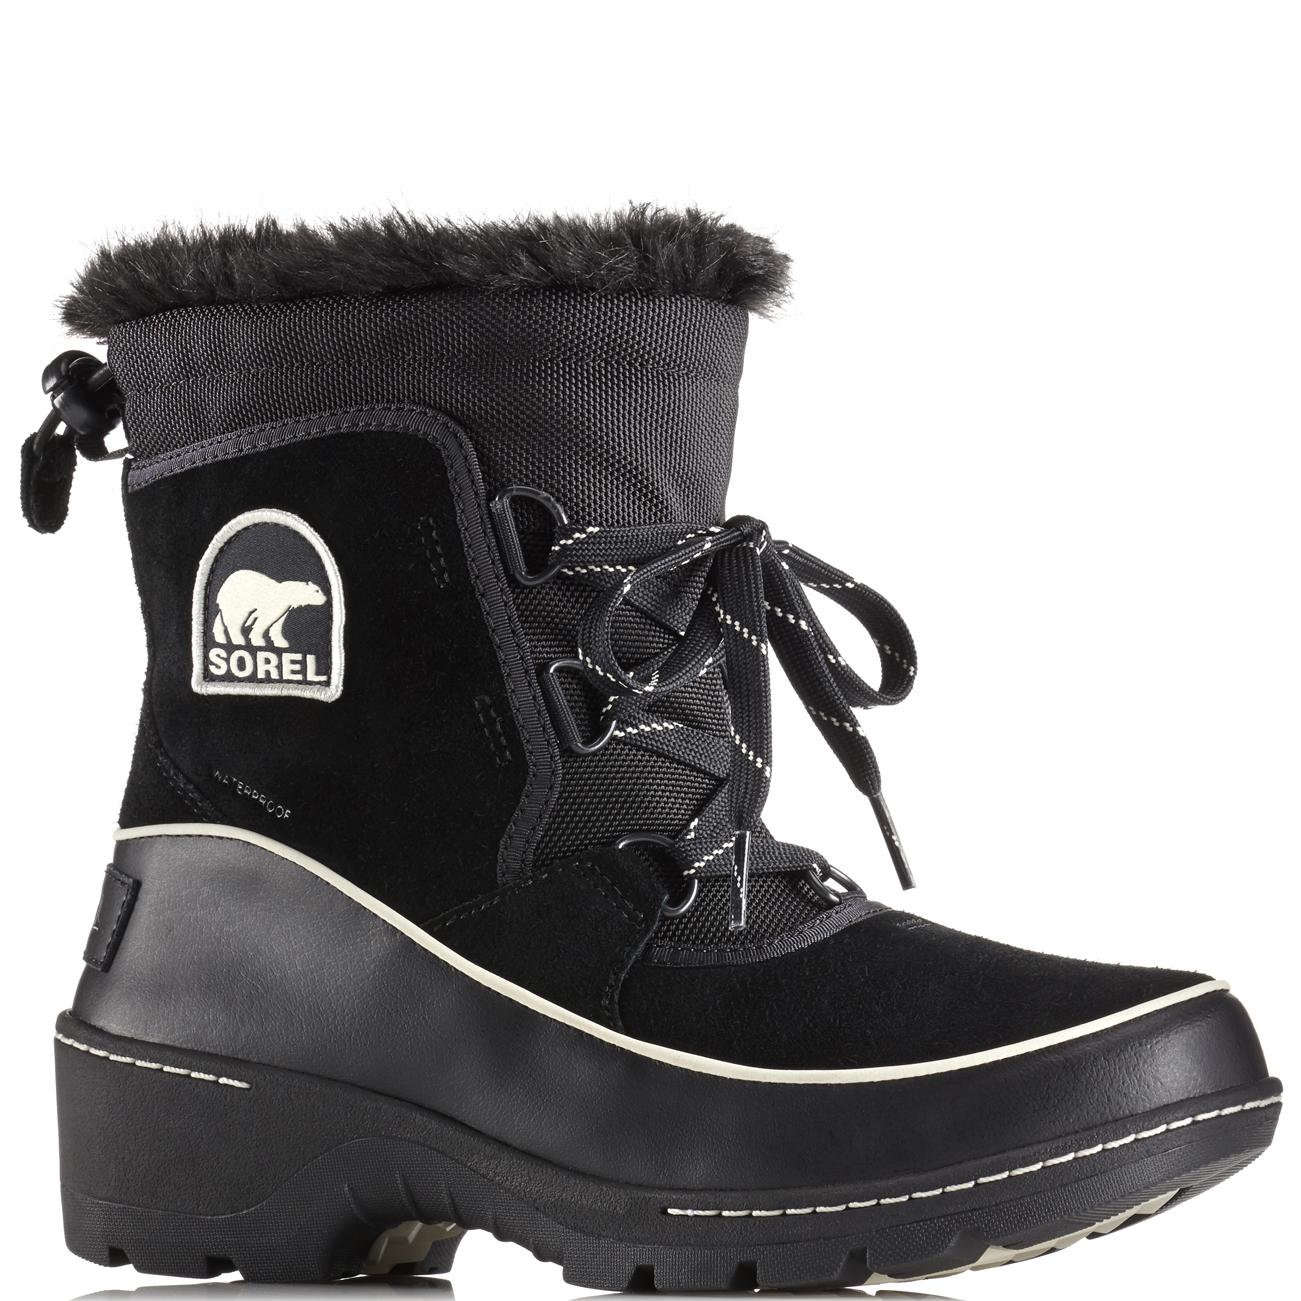 Ladies Sorel Torino Thermal Hiking Trekking Mountain Snow Ankle Boots All Sizes